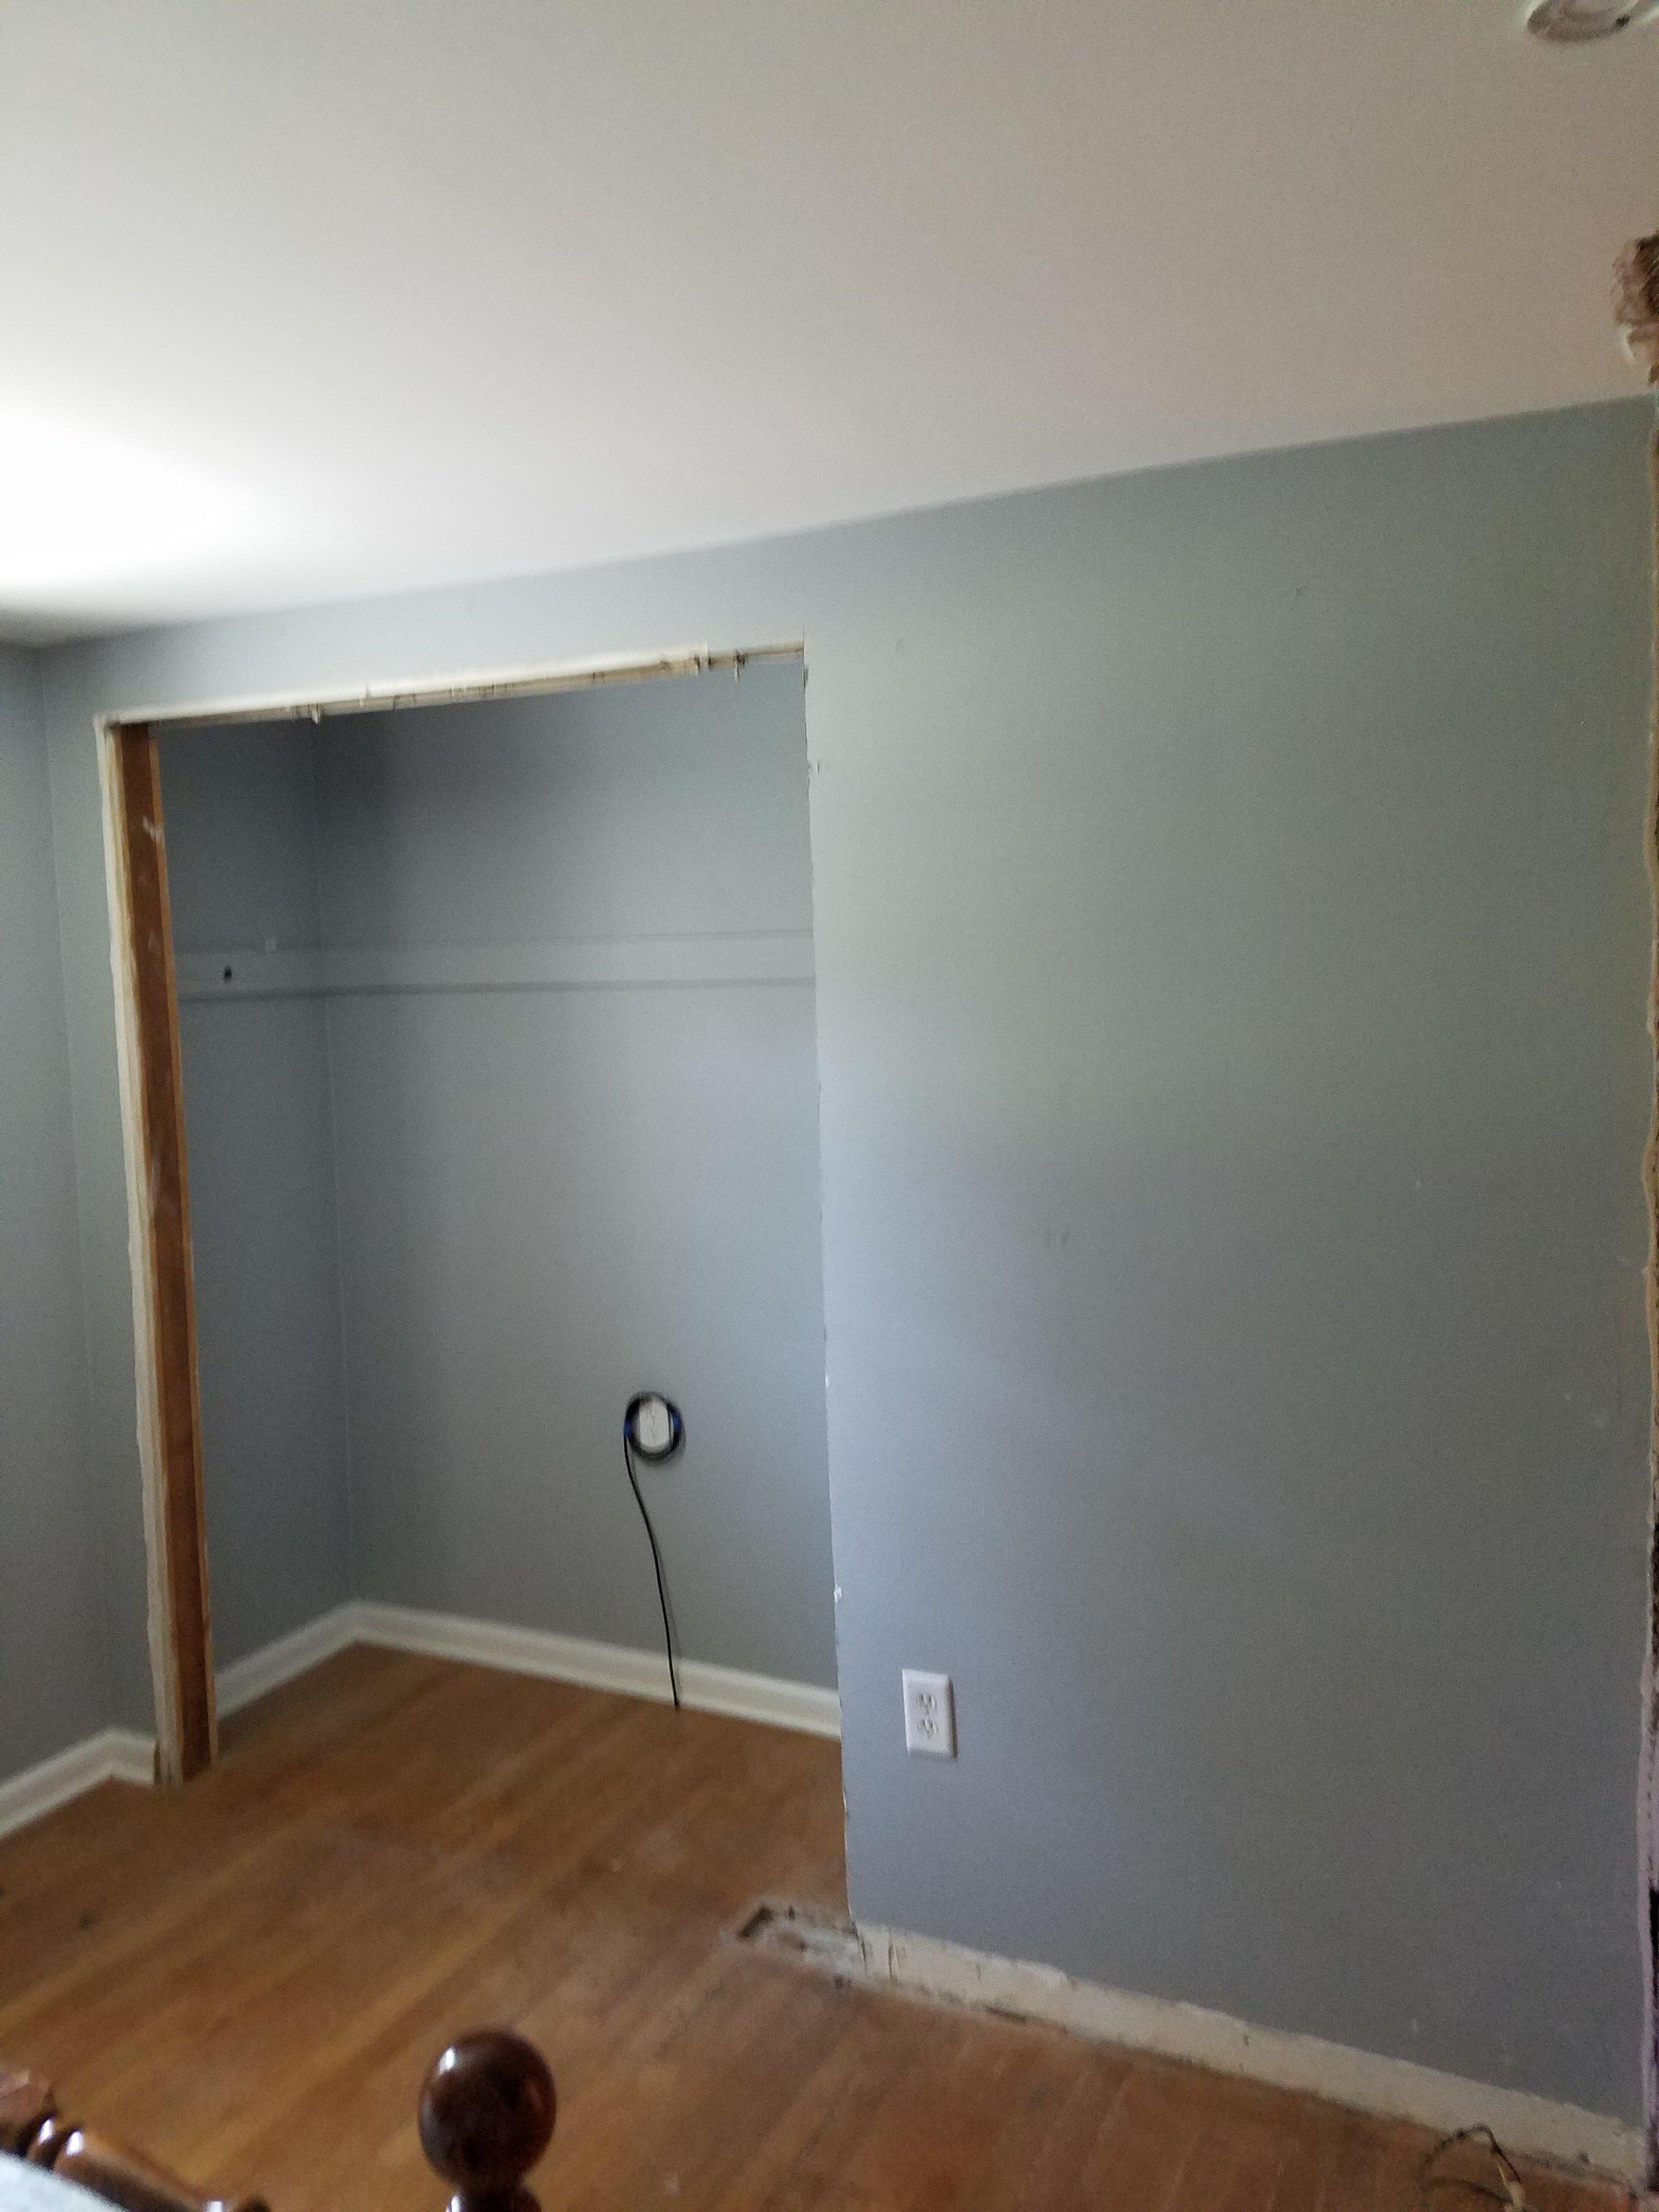 Harting closet expanded.jpg